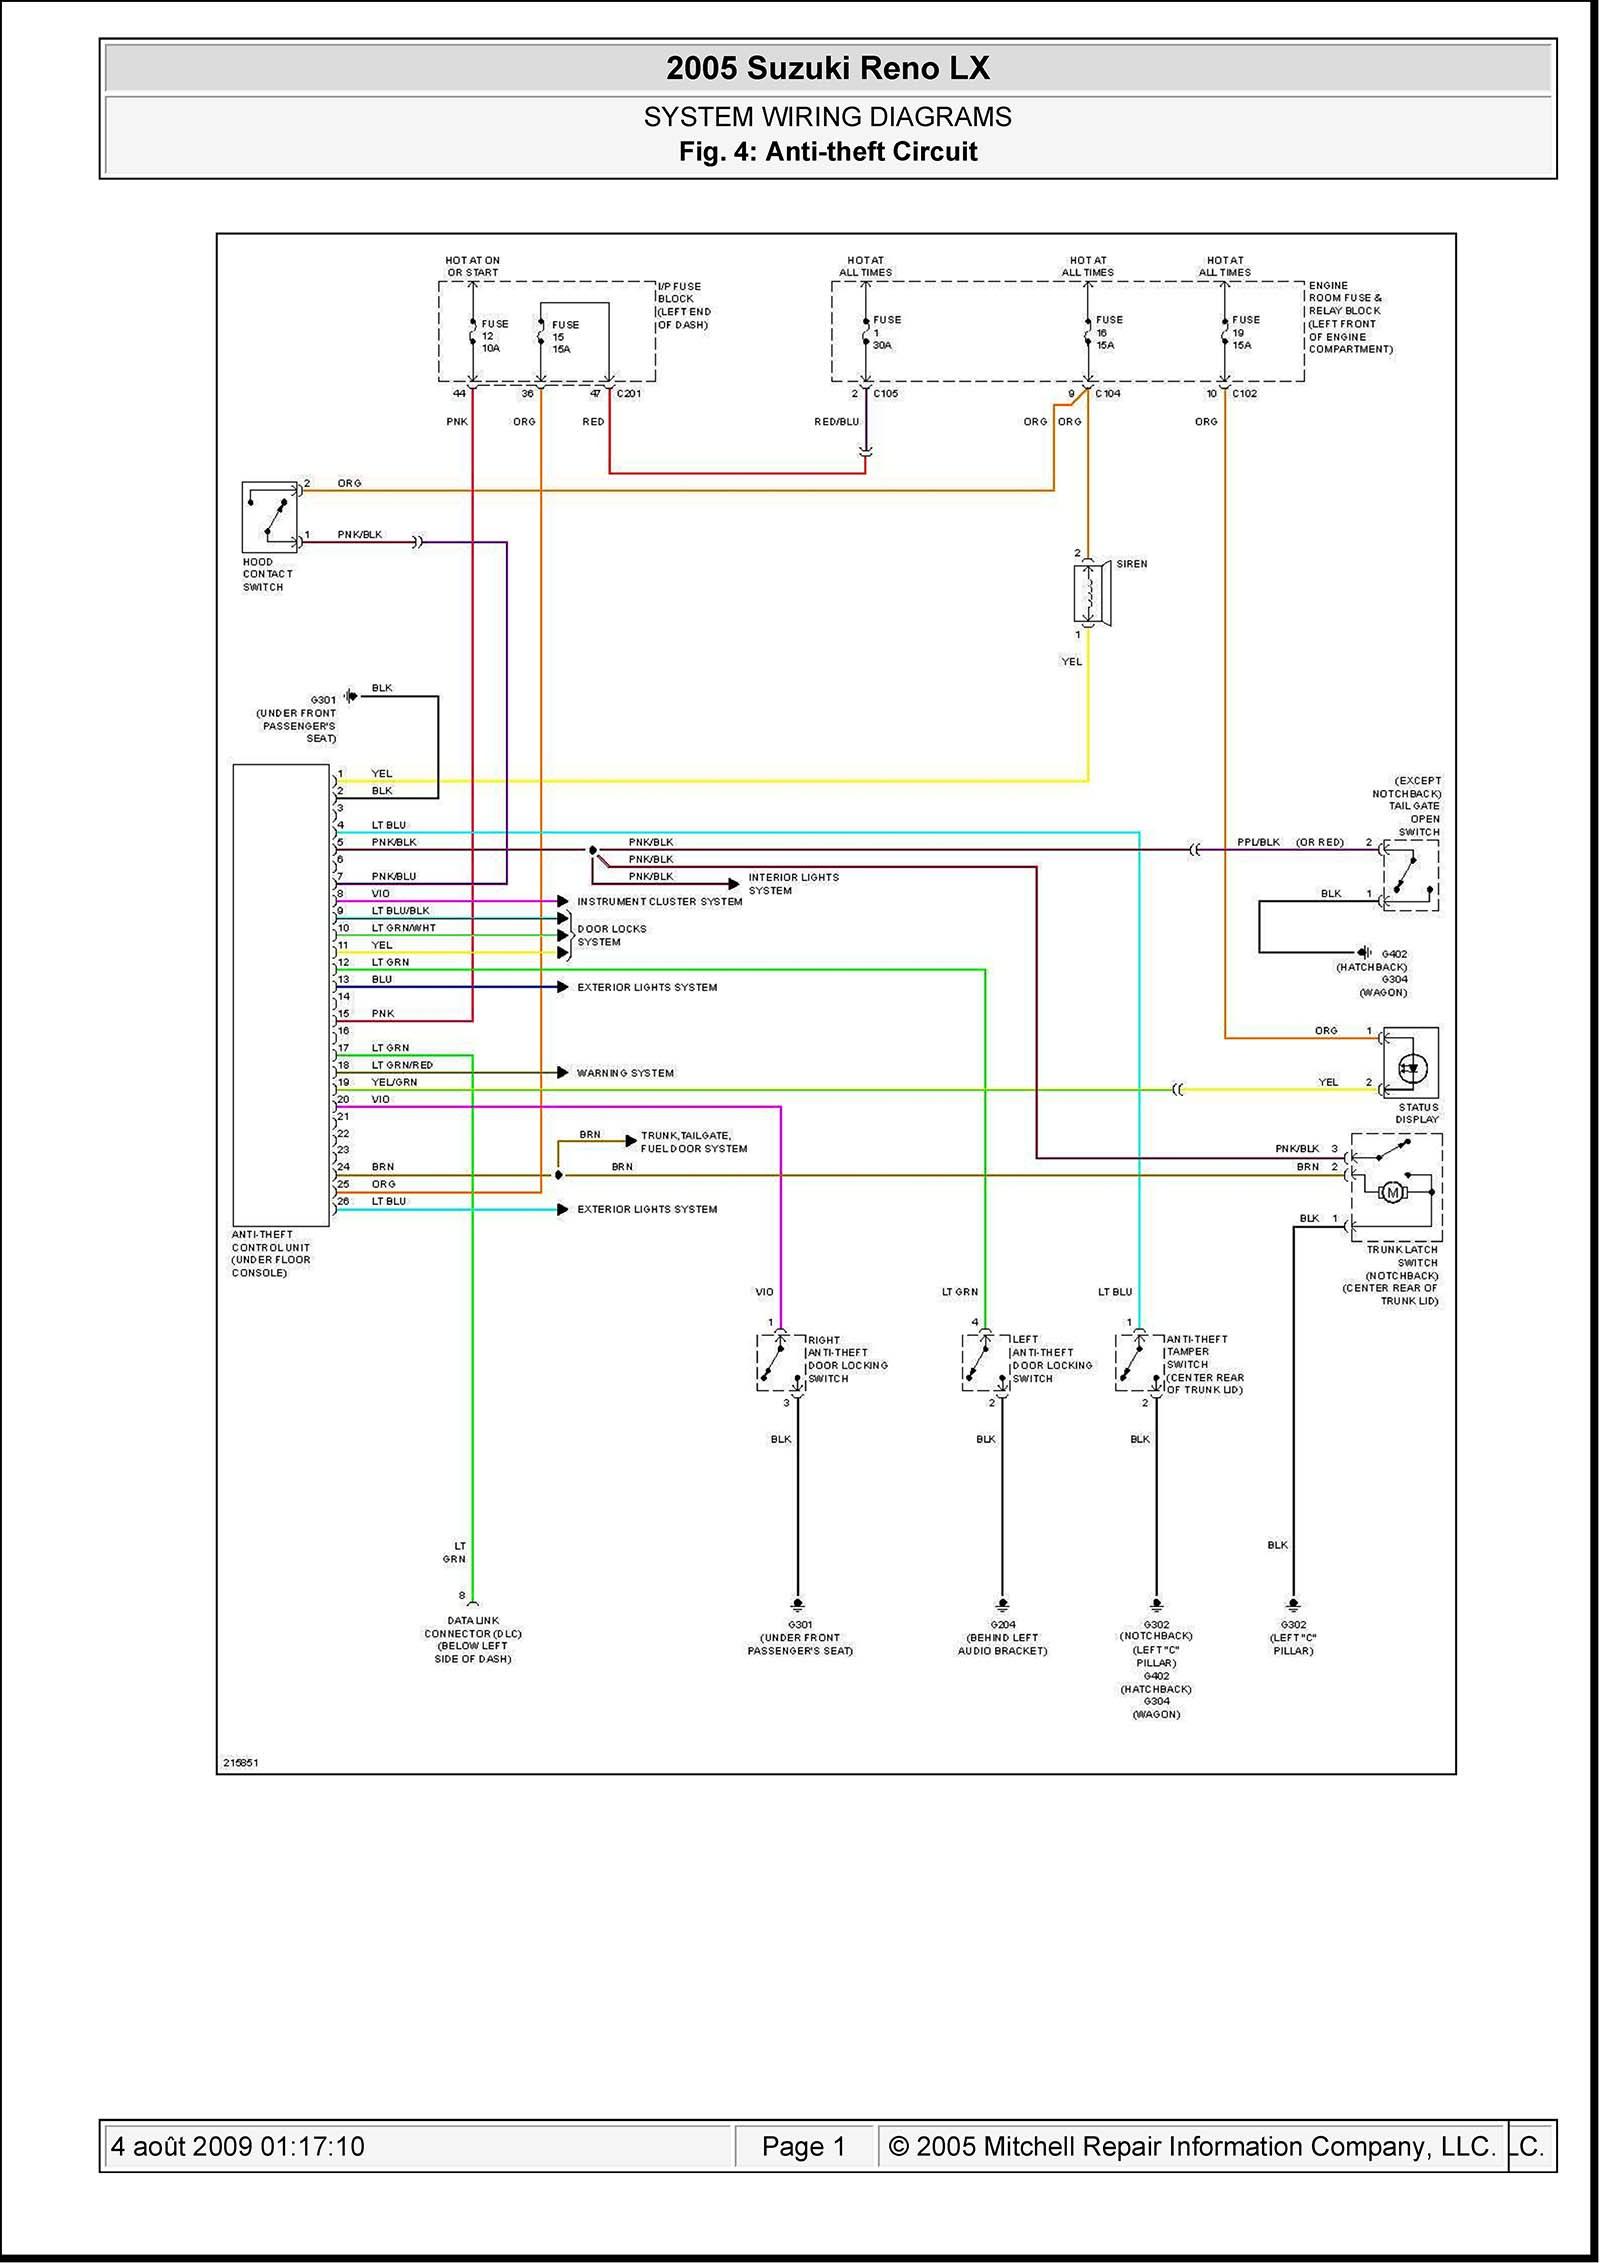 LT_9601] 2011 Aveo Fuse Diagram Schematic Wiring   Chevrolet Optra 2005 Wiring Diagram      Gue45 Ologi Emba Mohammedshrine Librar Wiring 101